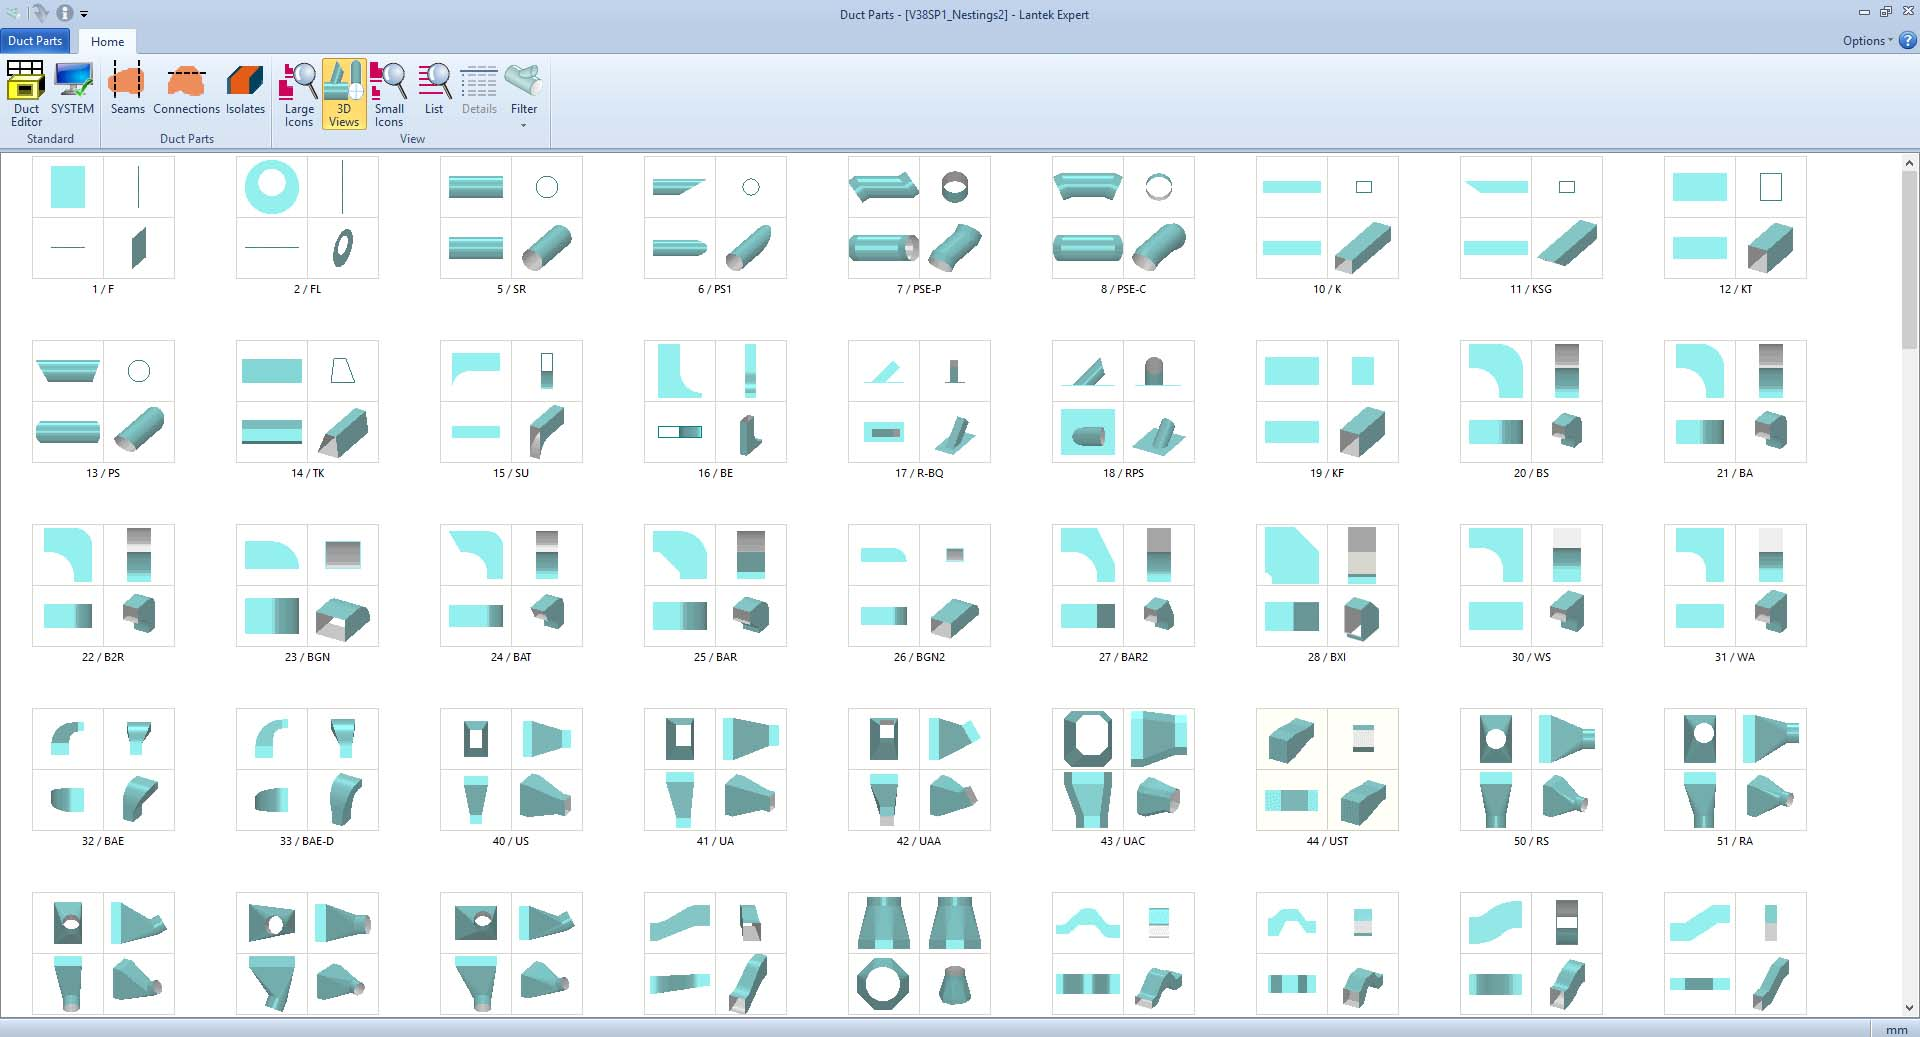 Lantek Expert Duct  - 그림 라이브러리